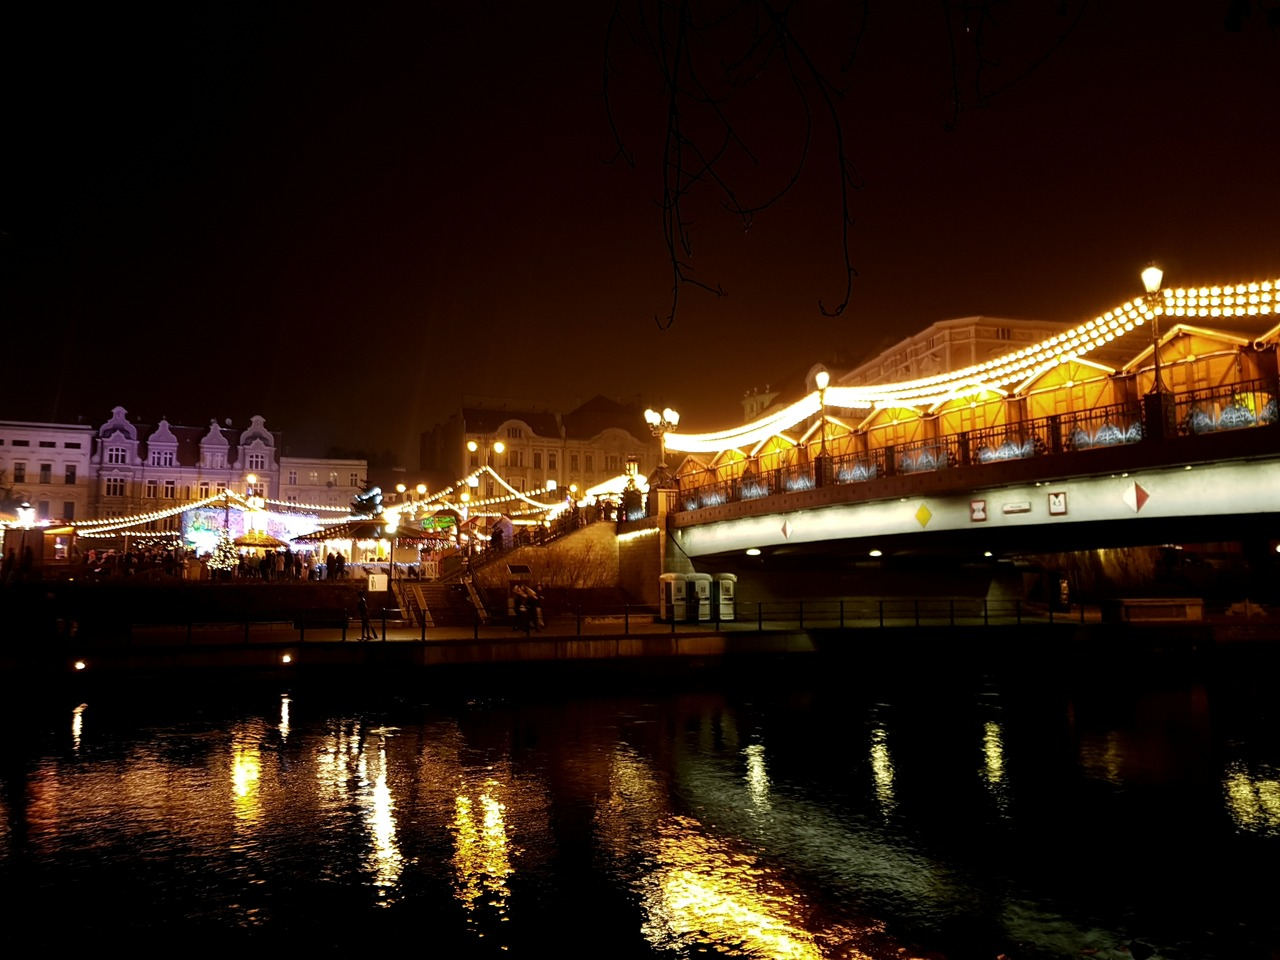 christmas market on the bridge in bydgoszcz